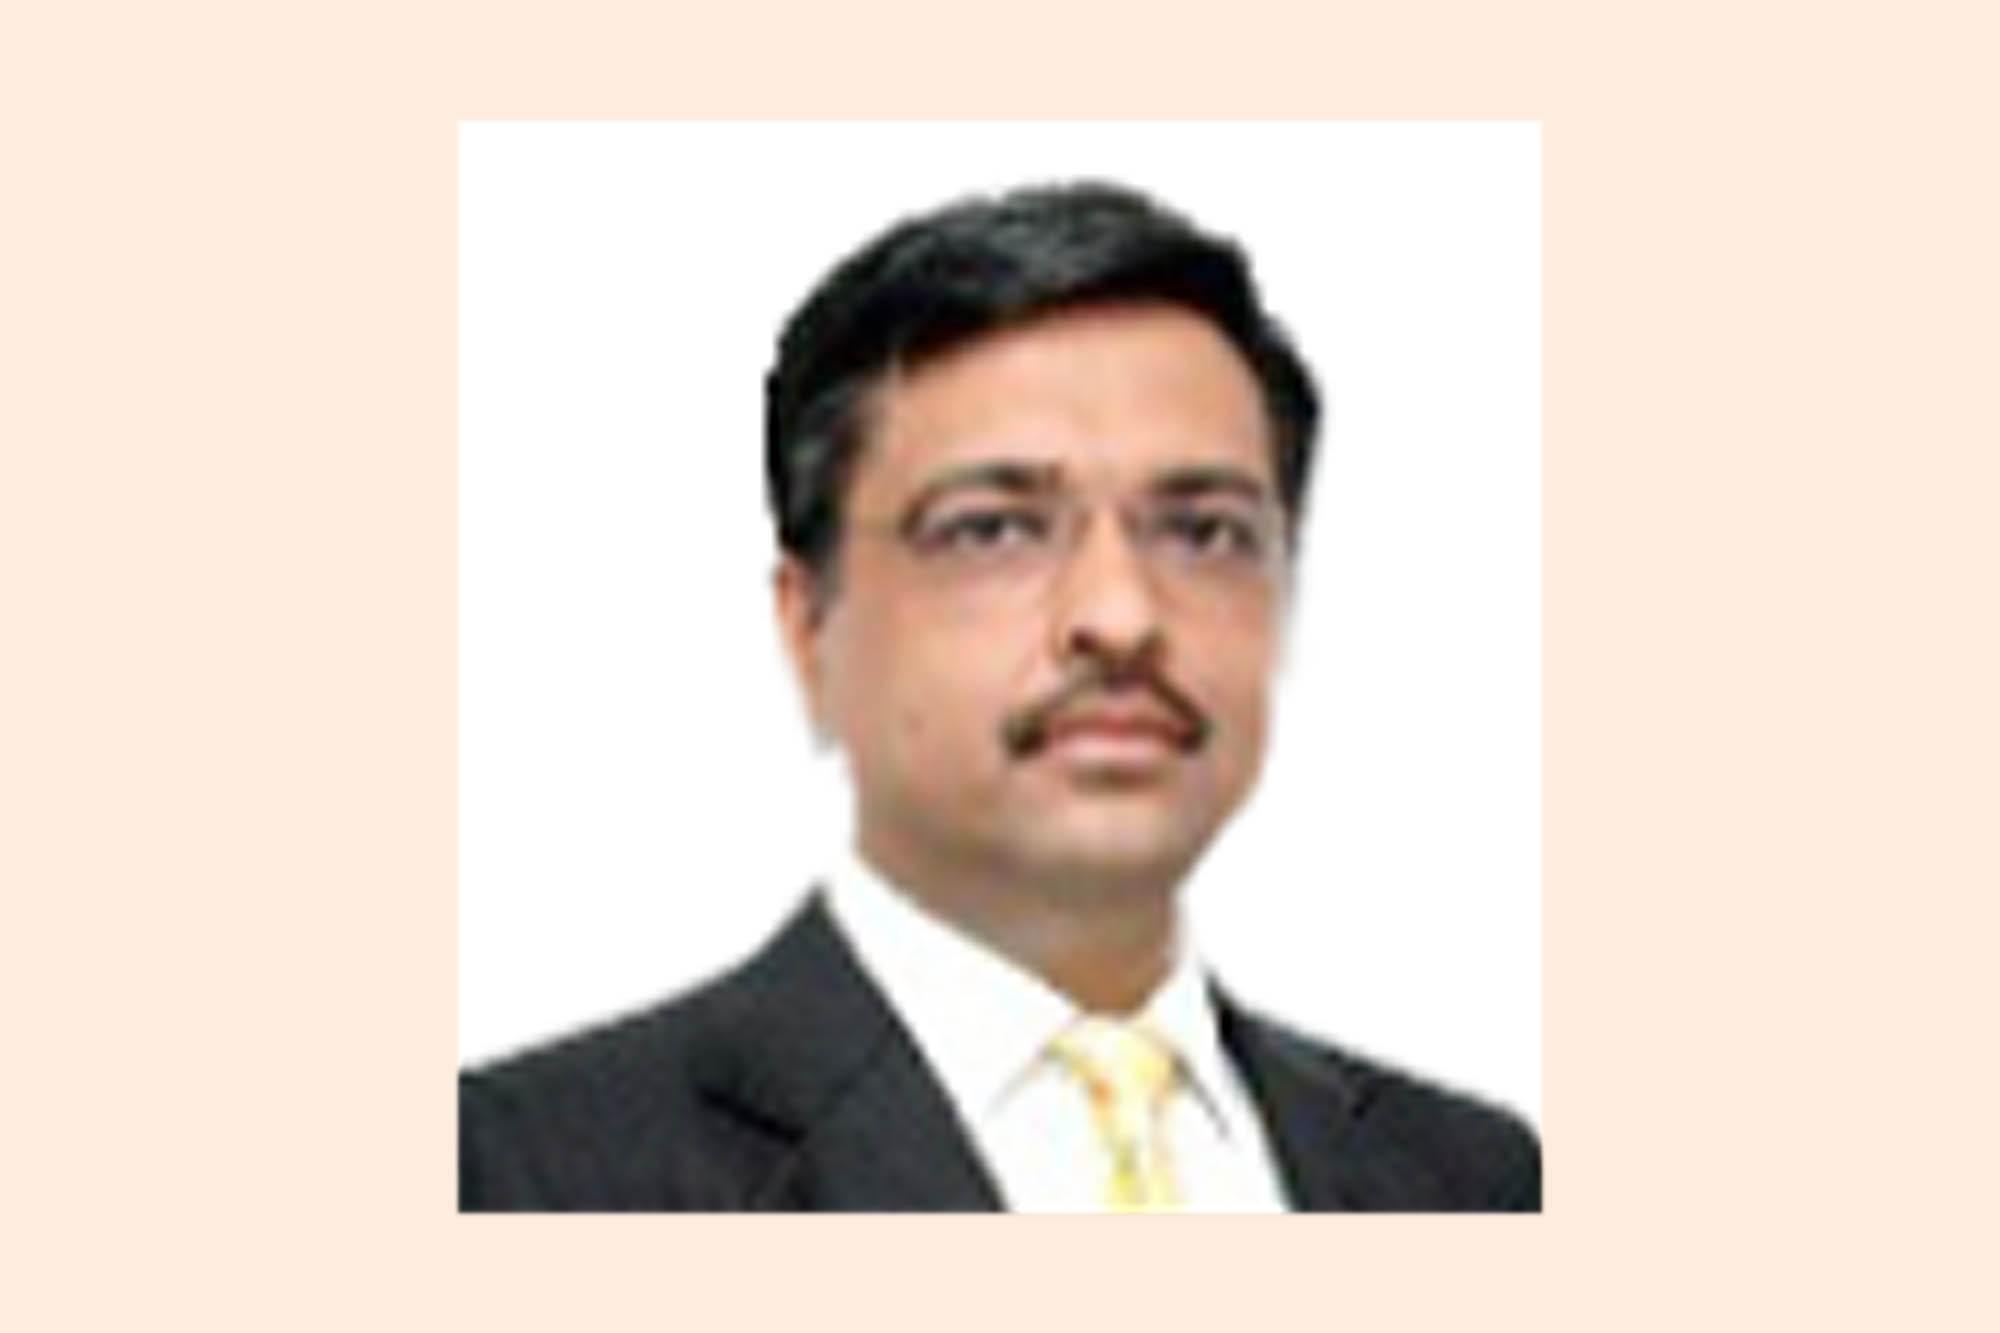 Kailash Lal Tarachandani, CEO, Inox Wind Ltd